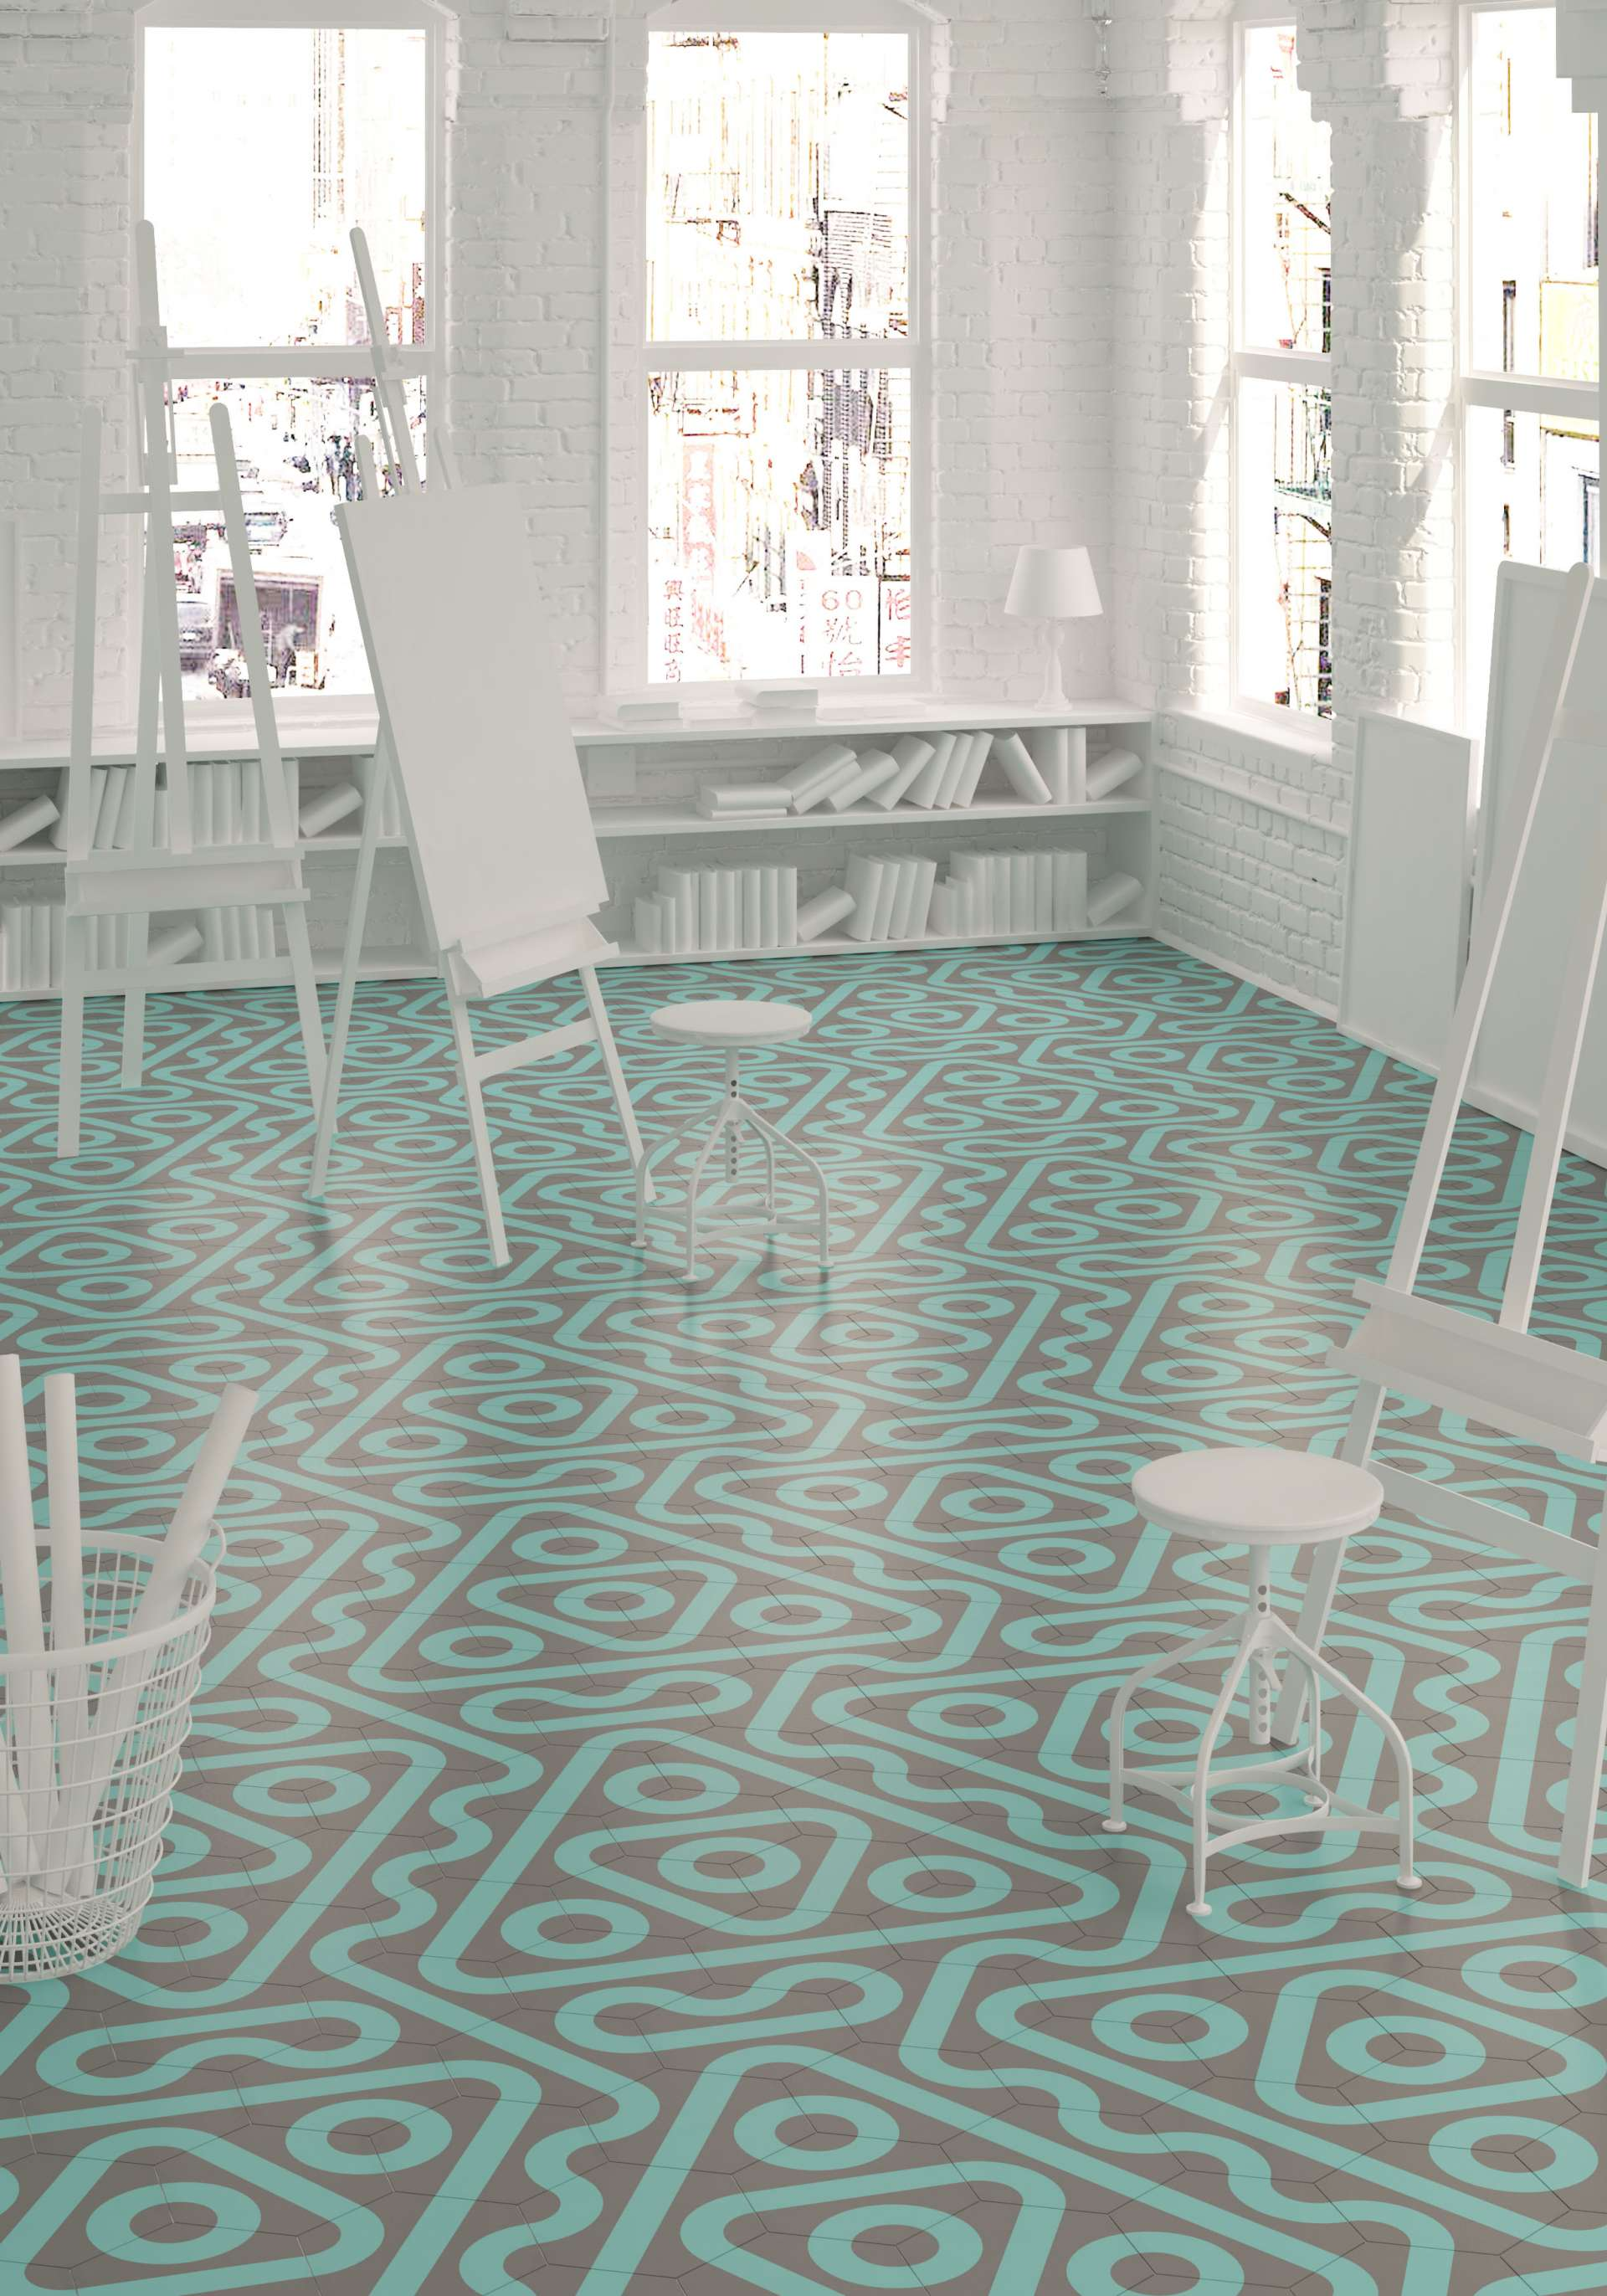 disen%cc%83o-interiores-gres-porcelanico-decoracion-illescas-toledo